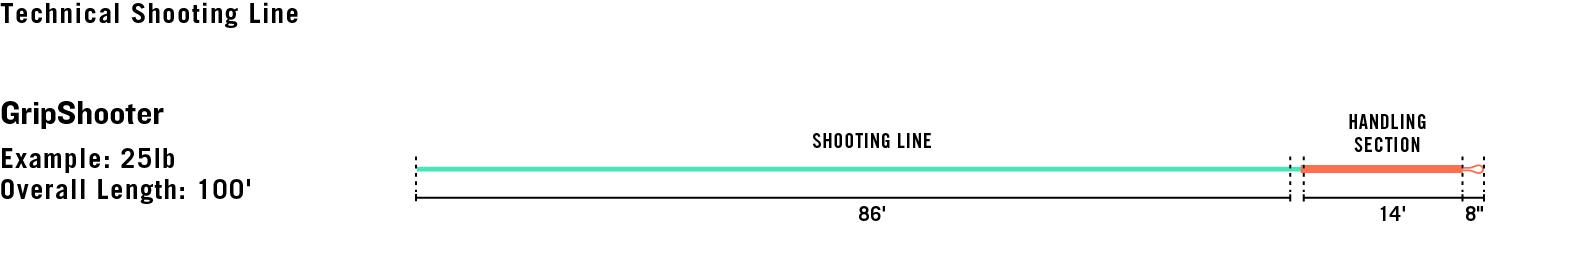 Gripshooter Shooting Line